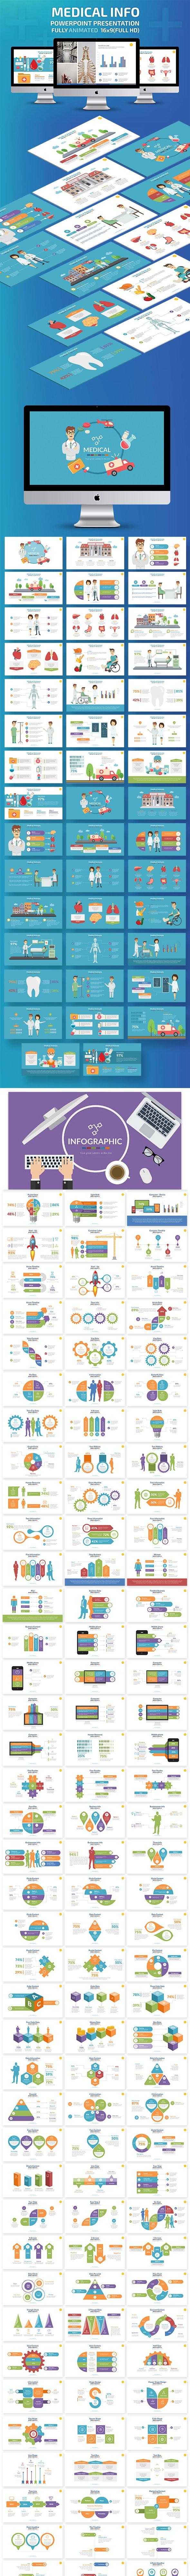 Medical Powerpoint Presentation - PowerPoint Templates Presentation Templates